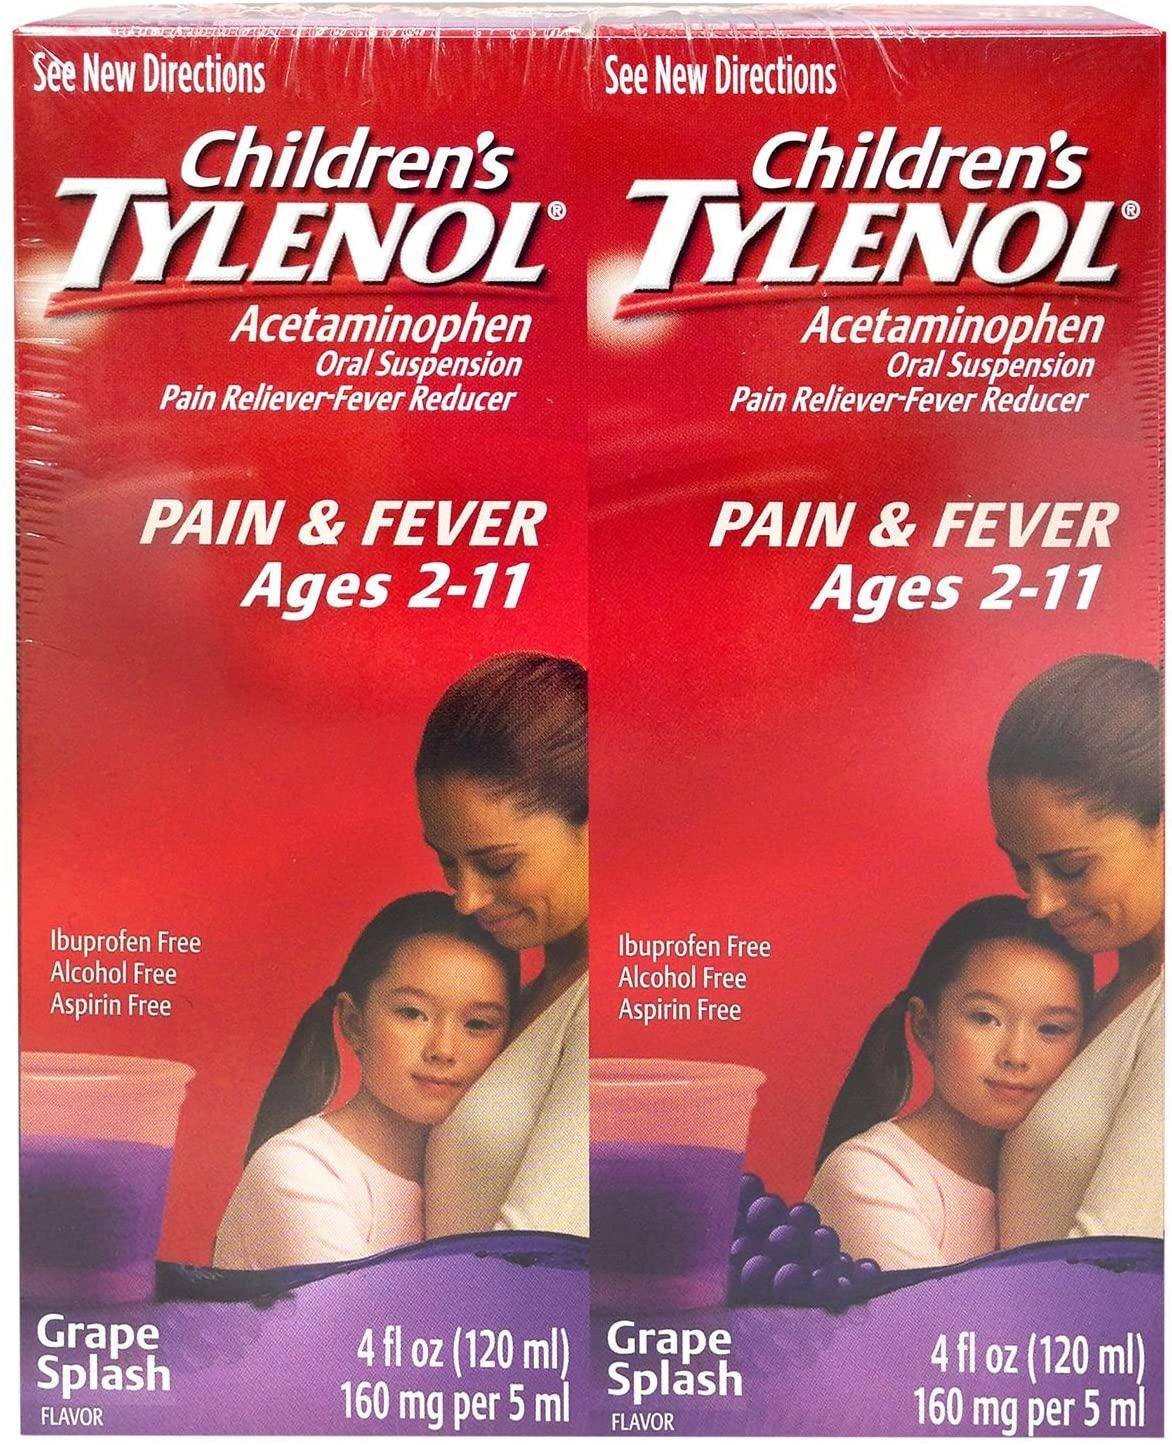 Children's Tylenol - 4 oz - 4 pk(Grape Splash Flavor)